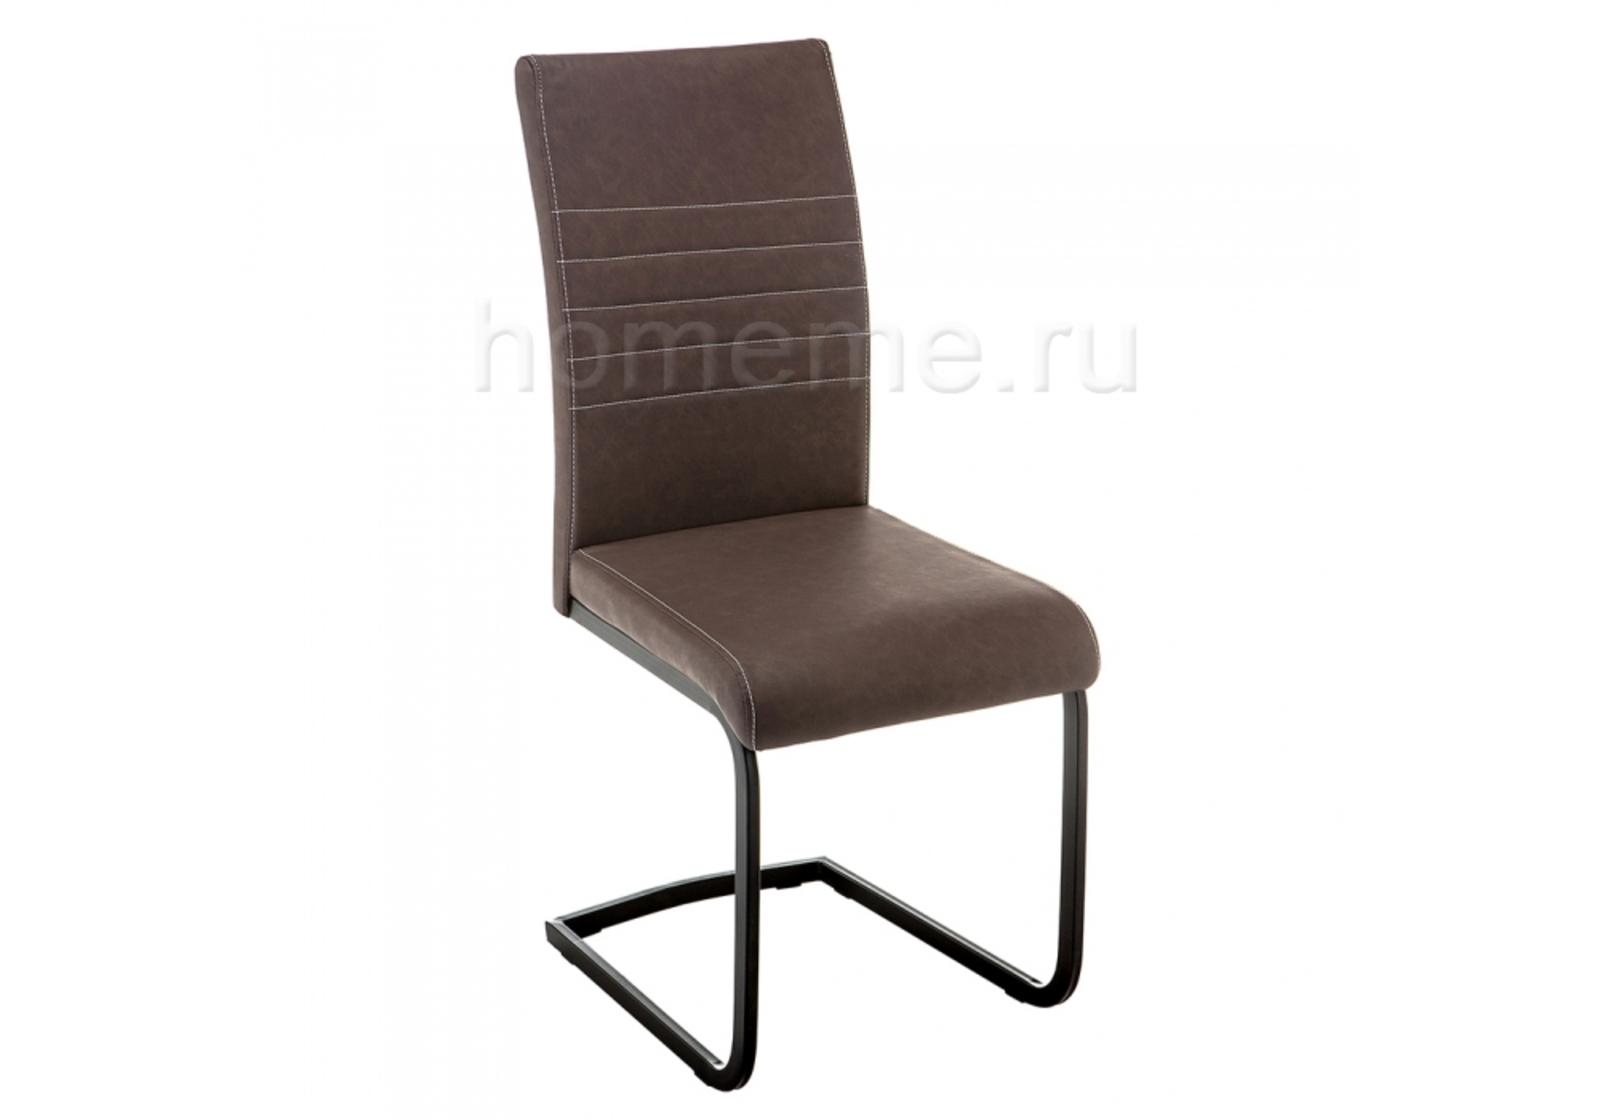 Стул HomeMe Porte коричневый 11208 от Homeme.ru